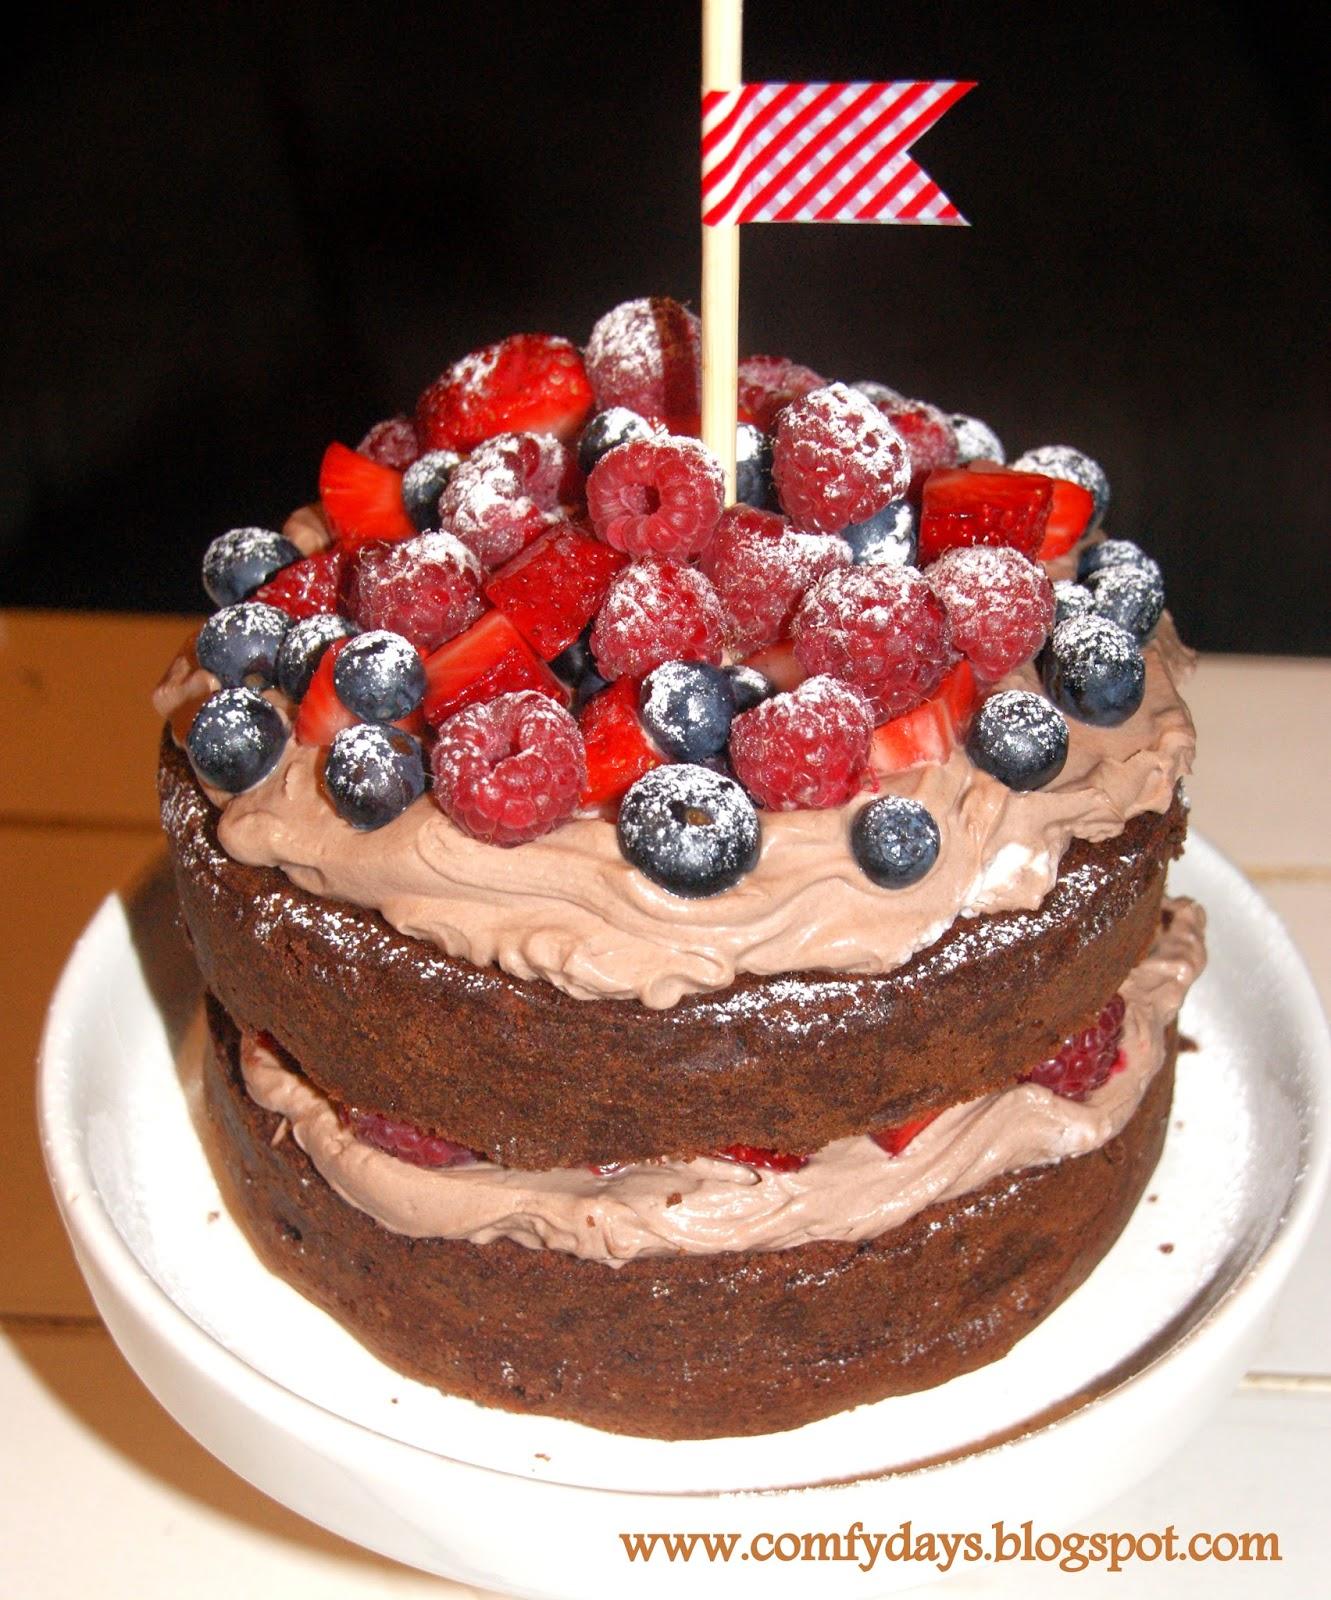 ComfyDays Most delicious birthday cake birthday present ideas